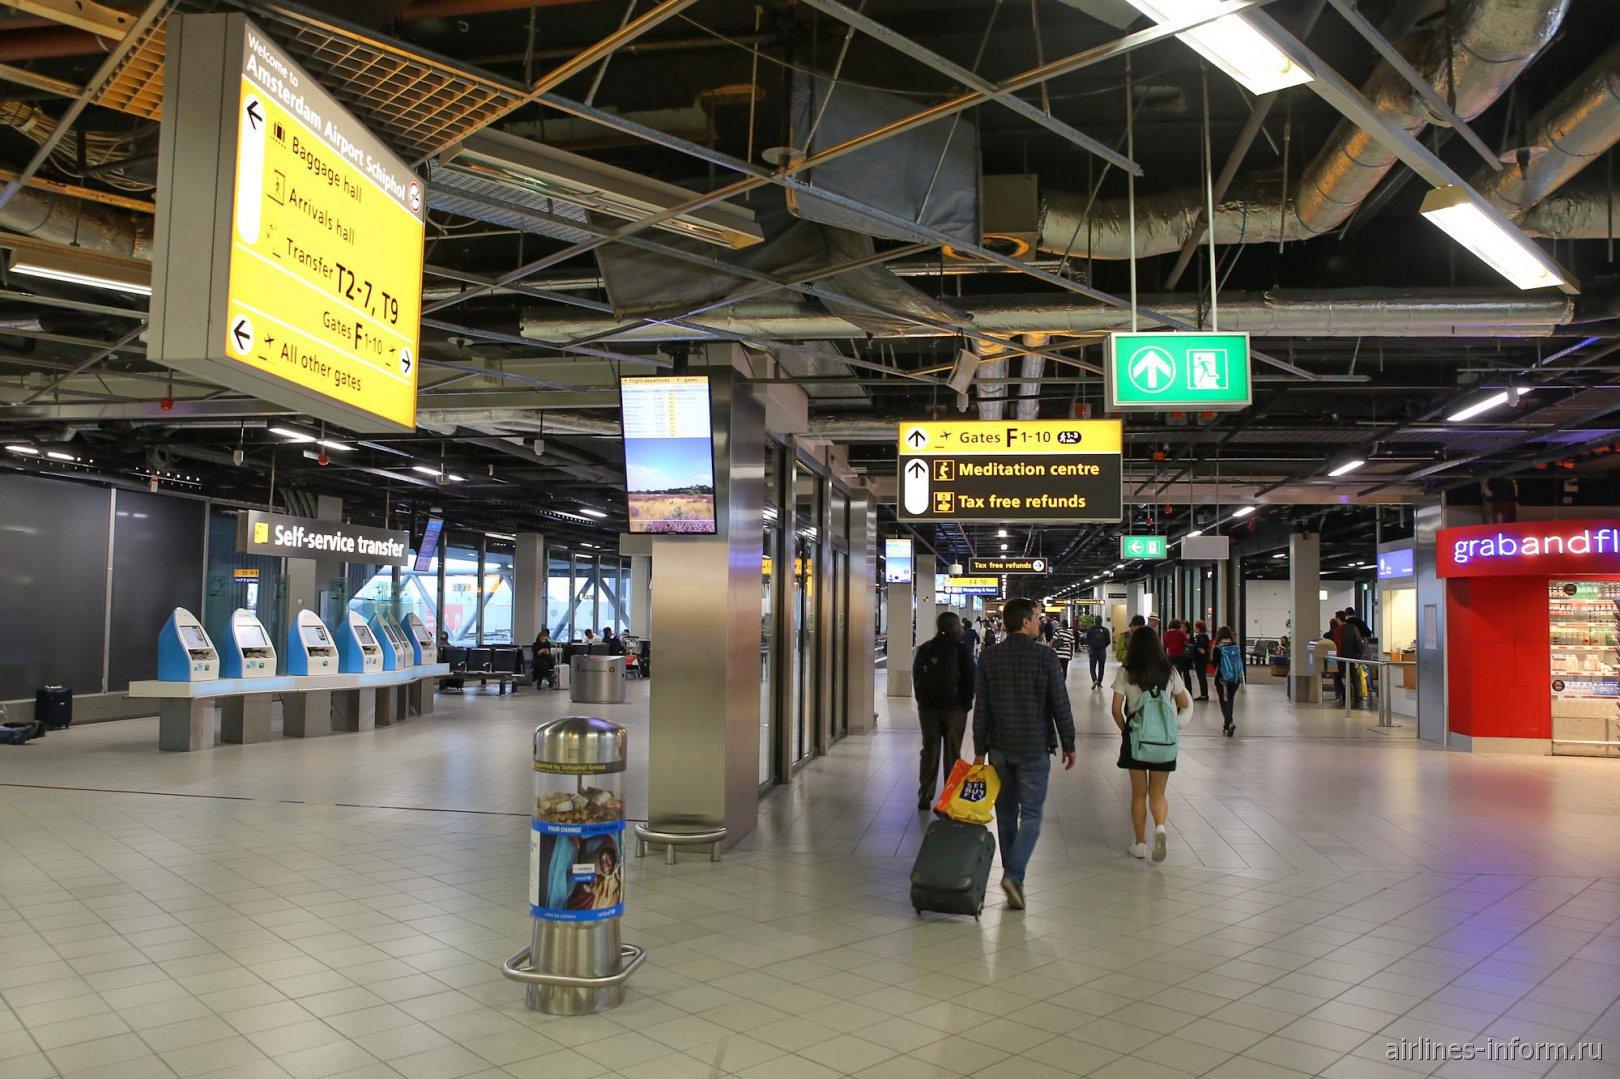 Зона выходов на посадку F в аэропорту Амстердам Схипхол